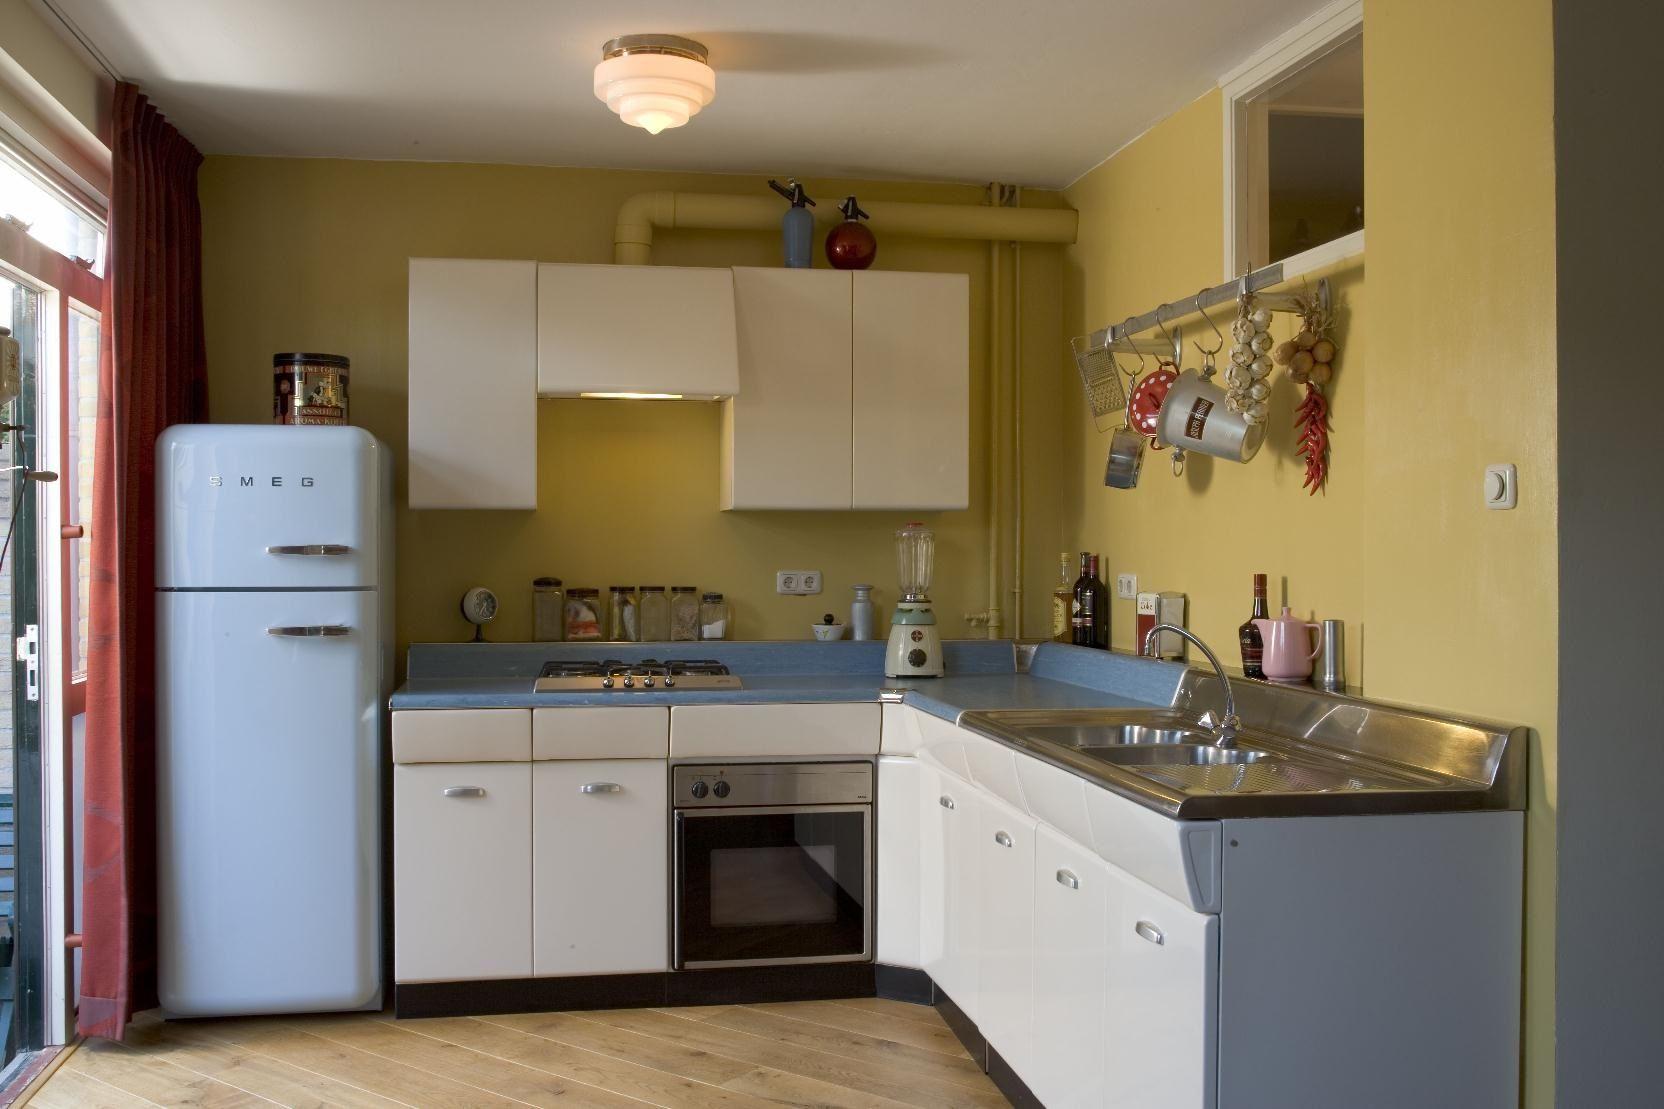 Retro Design Keuken : Retro design keuken naadloze retro keuken vroege kleurentechniek